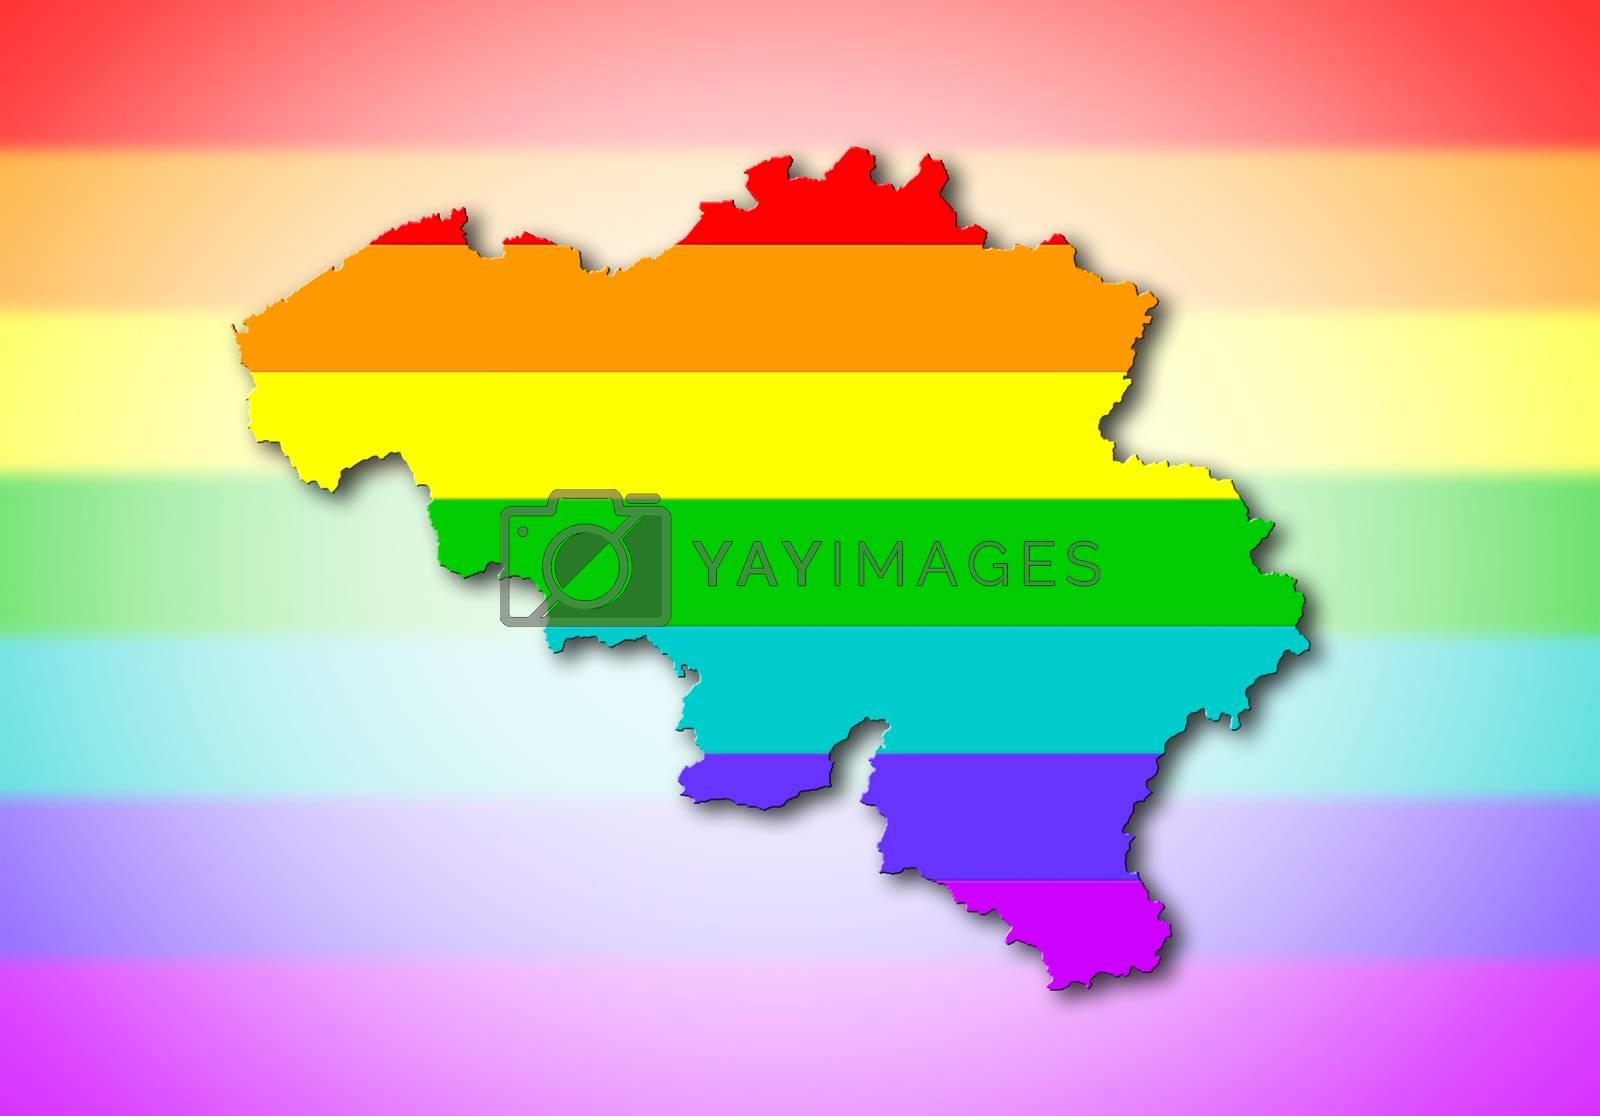 Royalty free image of Belgium - Rainbow flag pattern by michaklootwijk